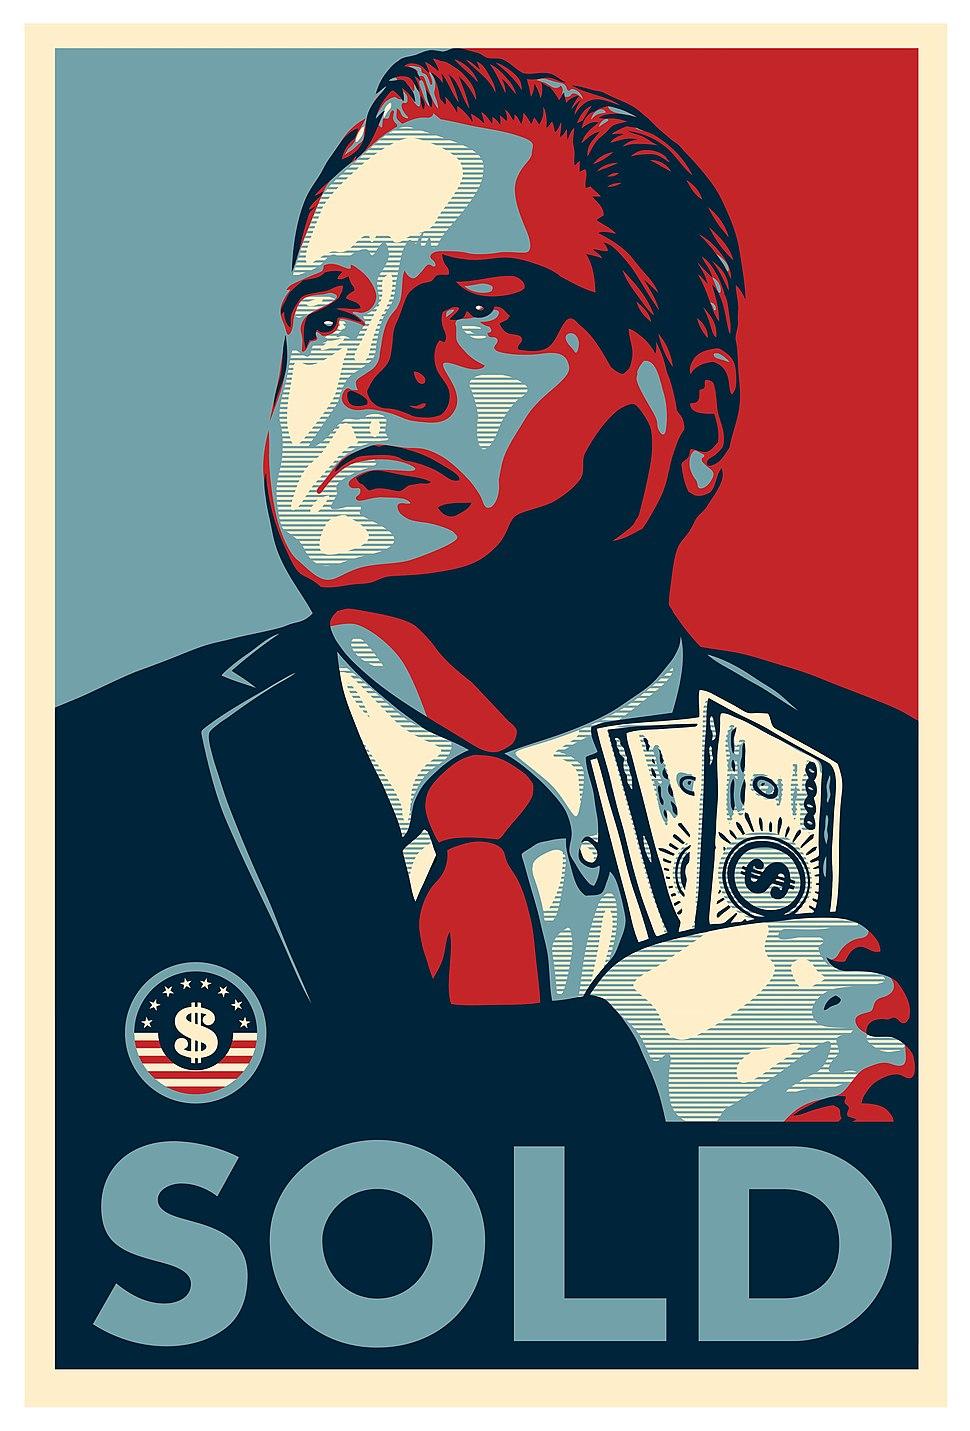 Honest Gil Fulbright SOLD Poster